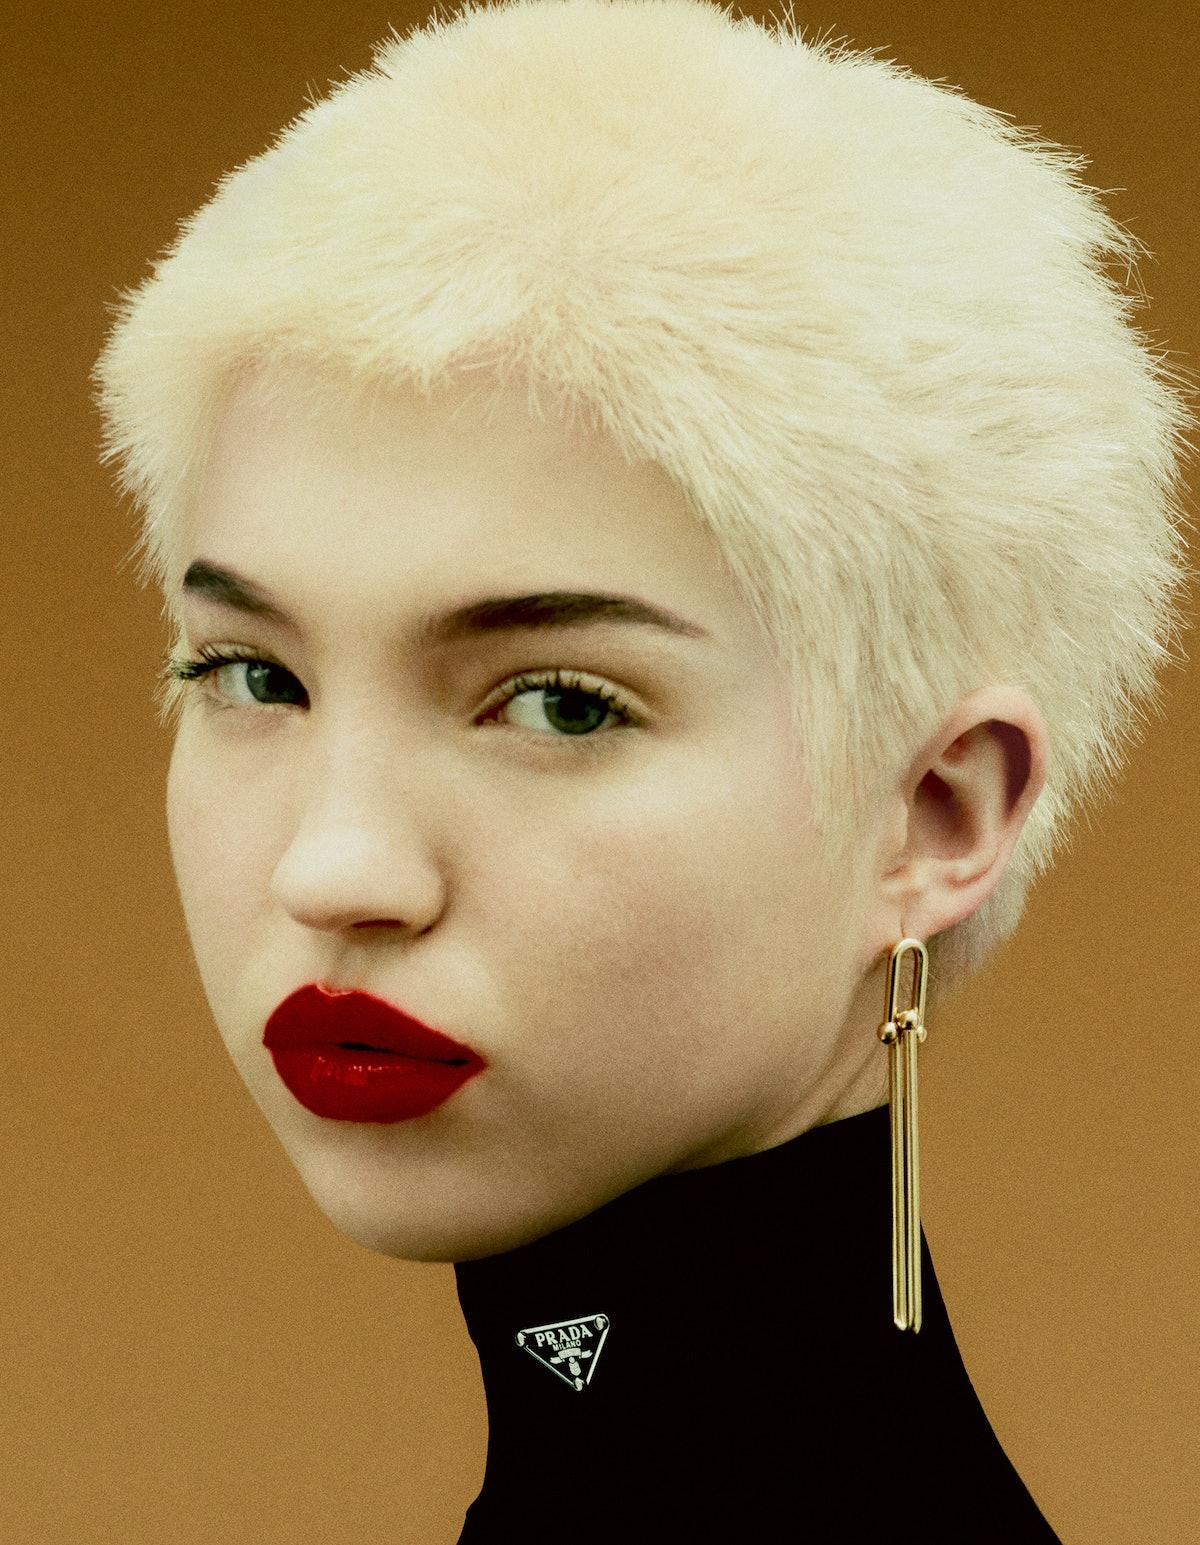 Lila Moss wears a Prada turtleneck; Tiffany & Co. earrings. Rouge Dior Satin Lipstick in #869 Sophisticated.